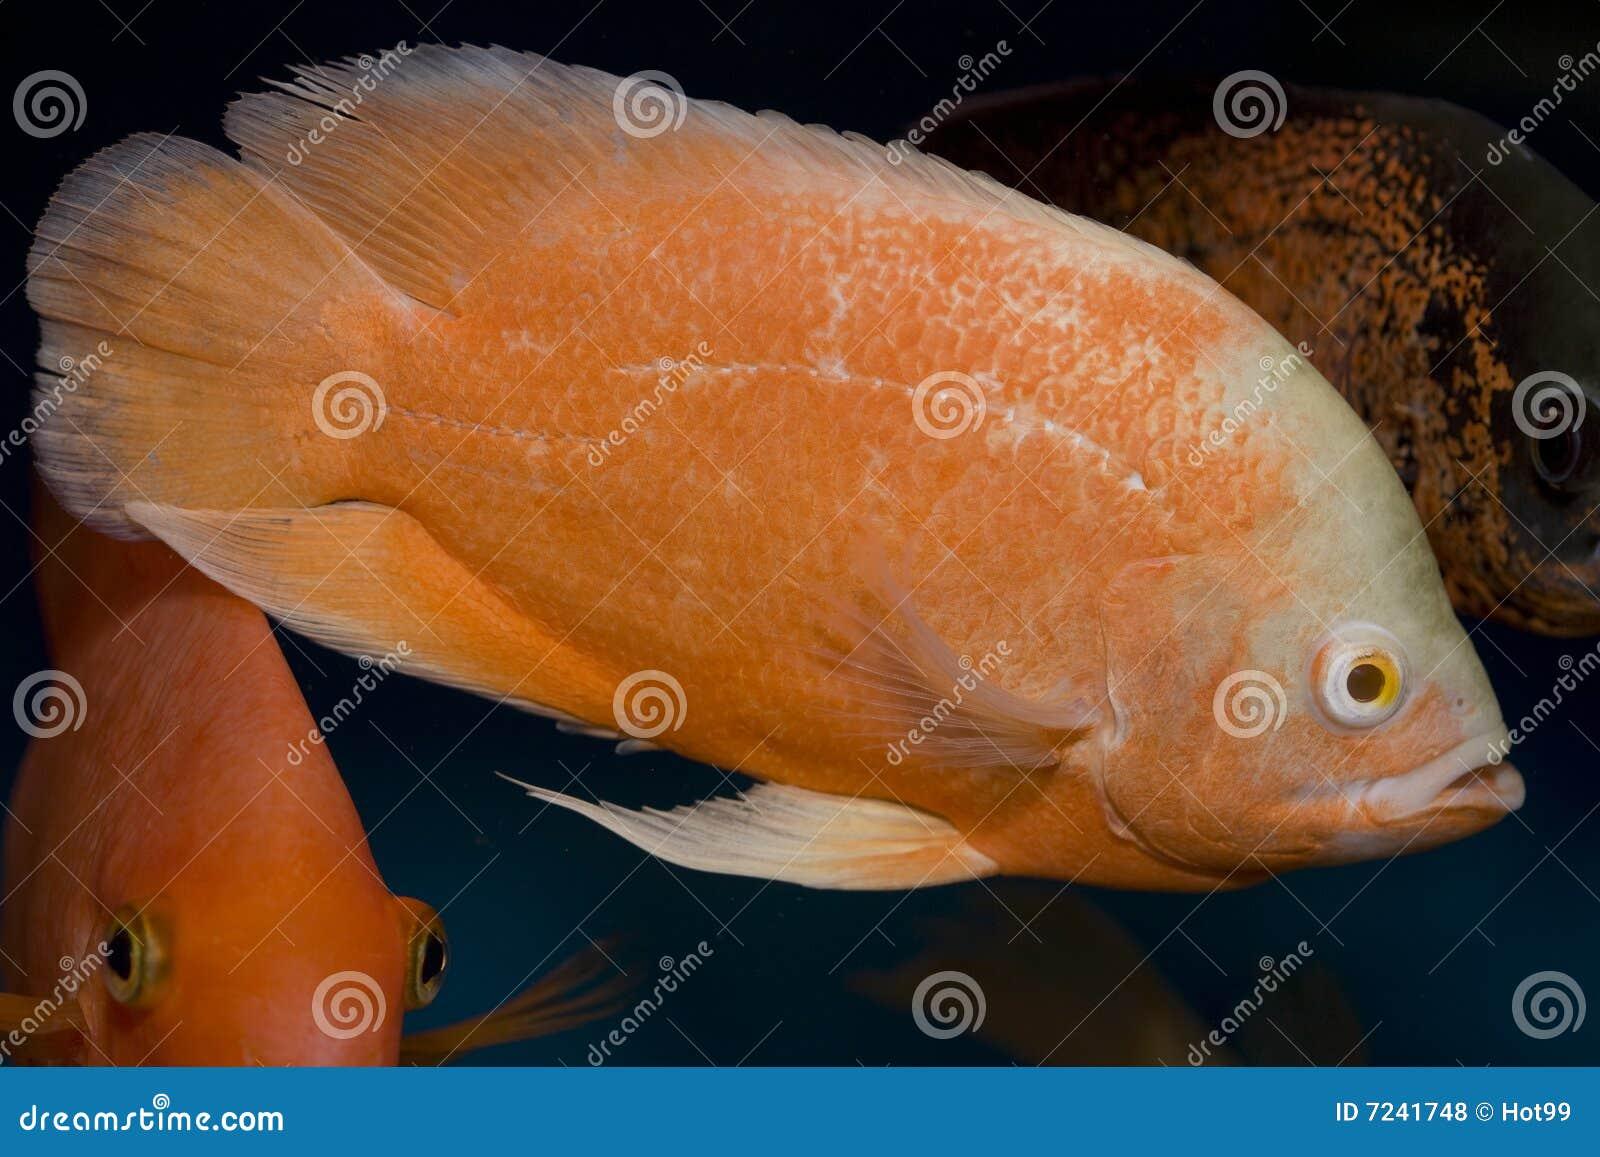 Red Oscar Fish Royalty Free Stock Photos Image 7241748